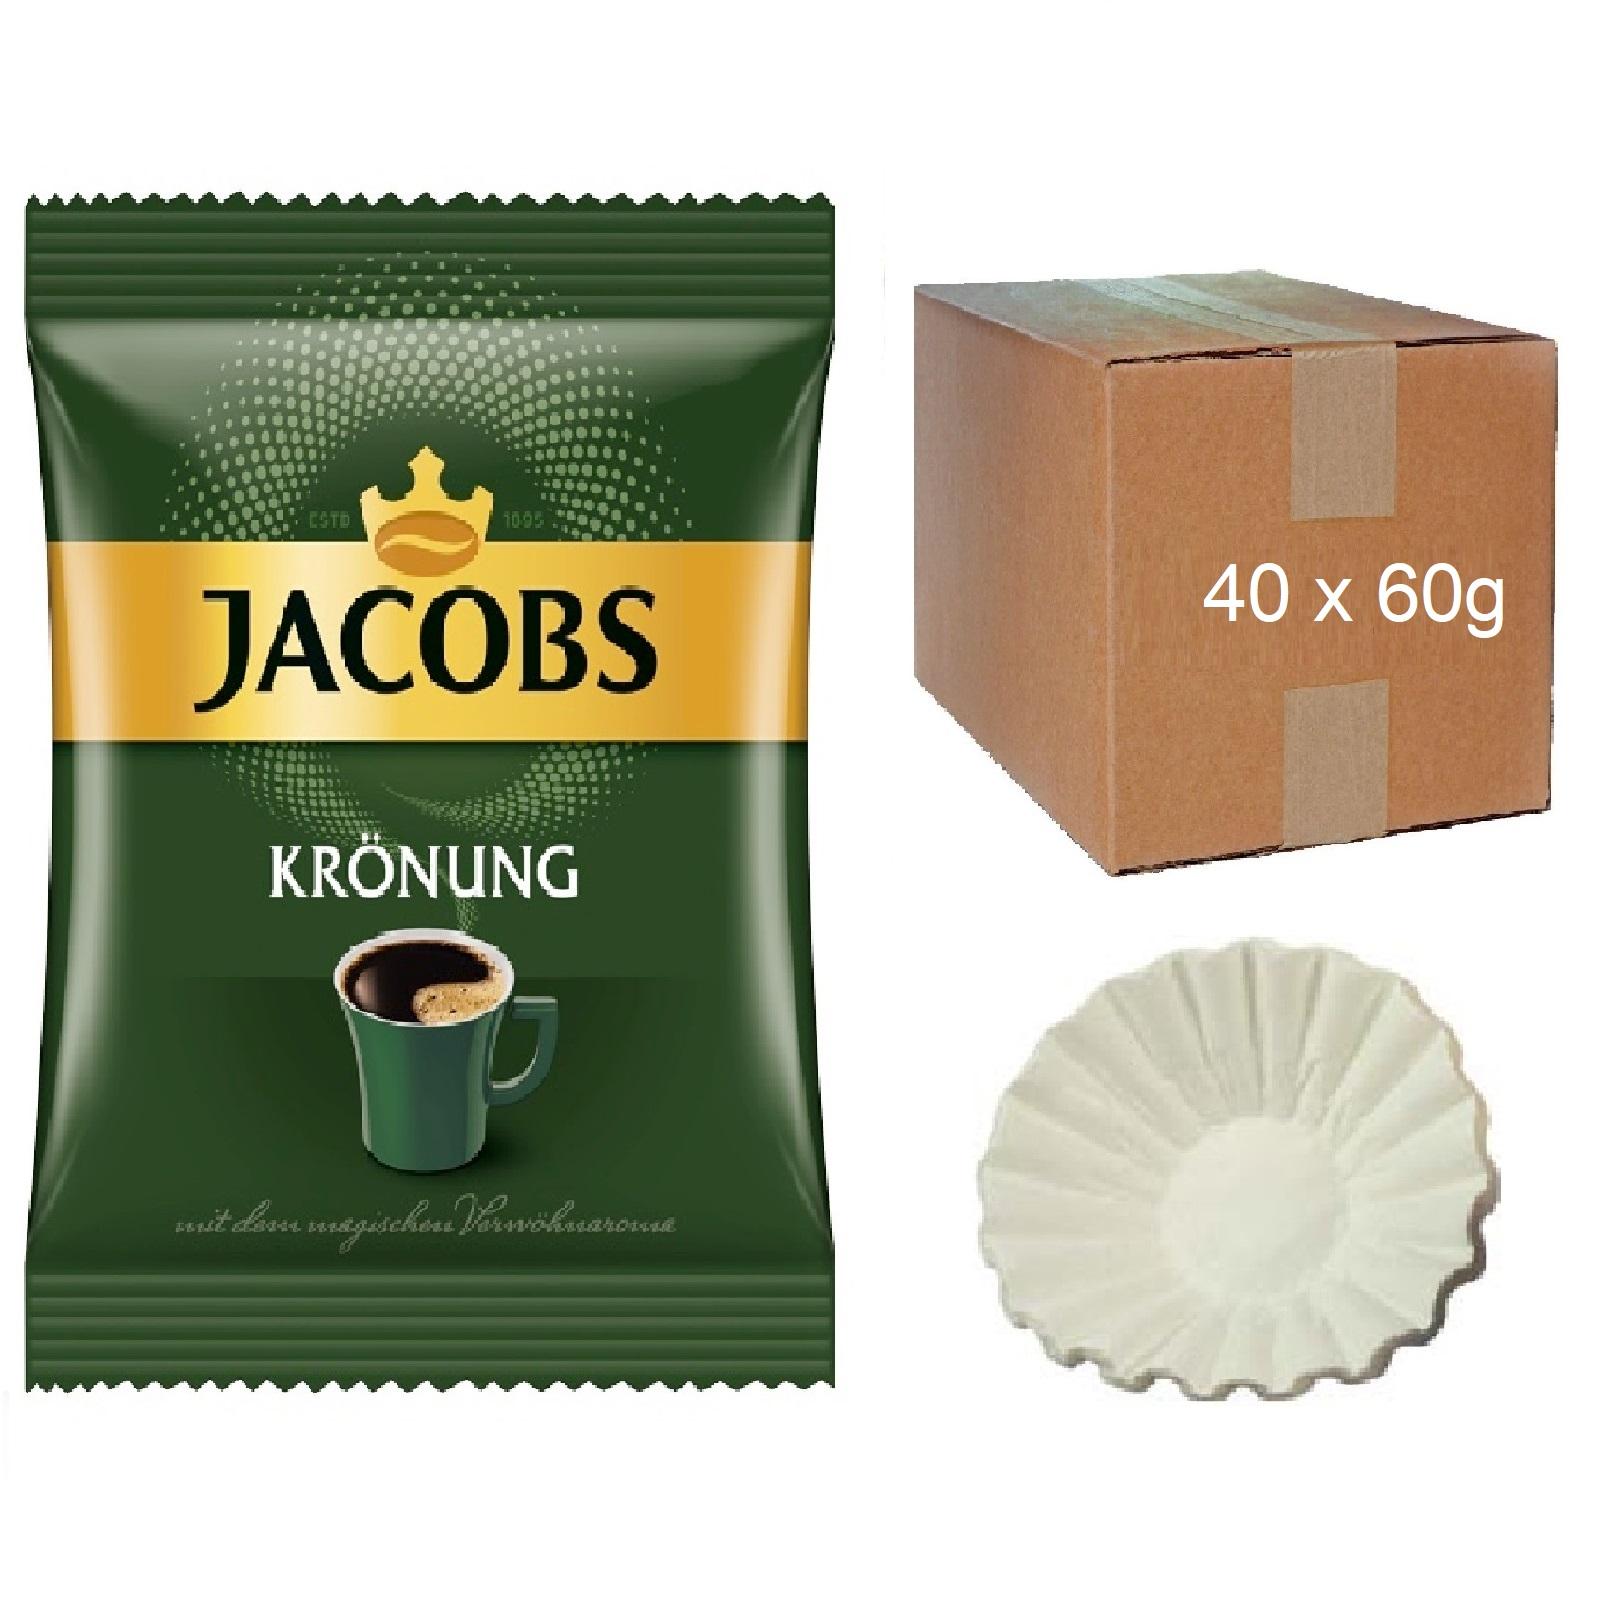 Jacobs Krönung Klassisch 40 x 60g (ehemals Balance) Kaffee Servicepaket inkl. 50 Korbfilter